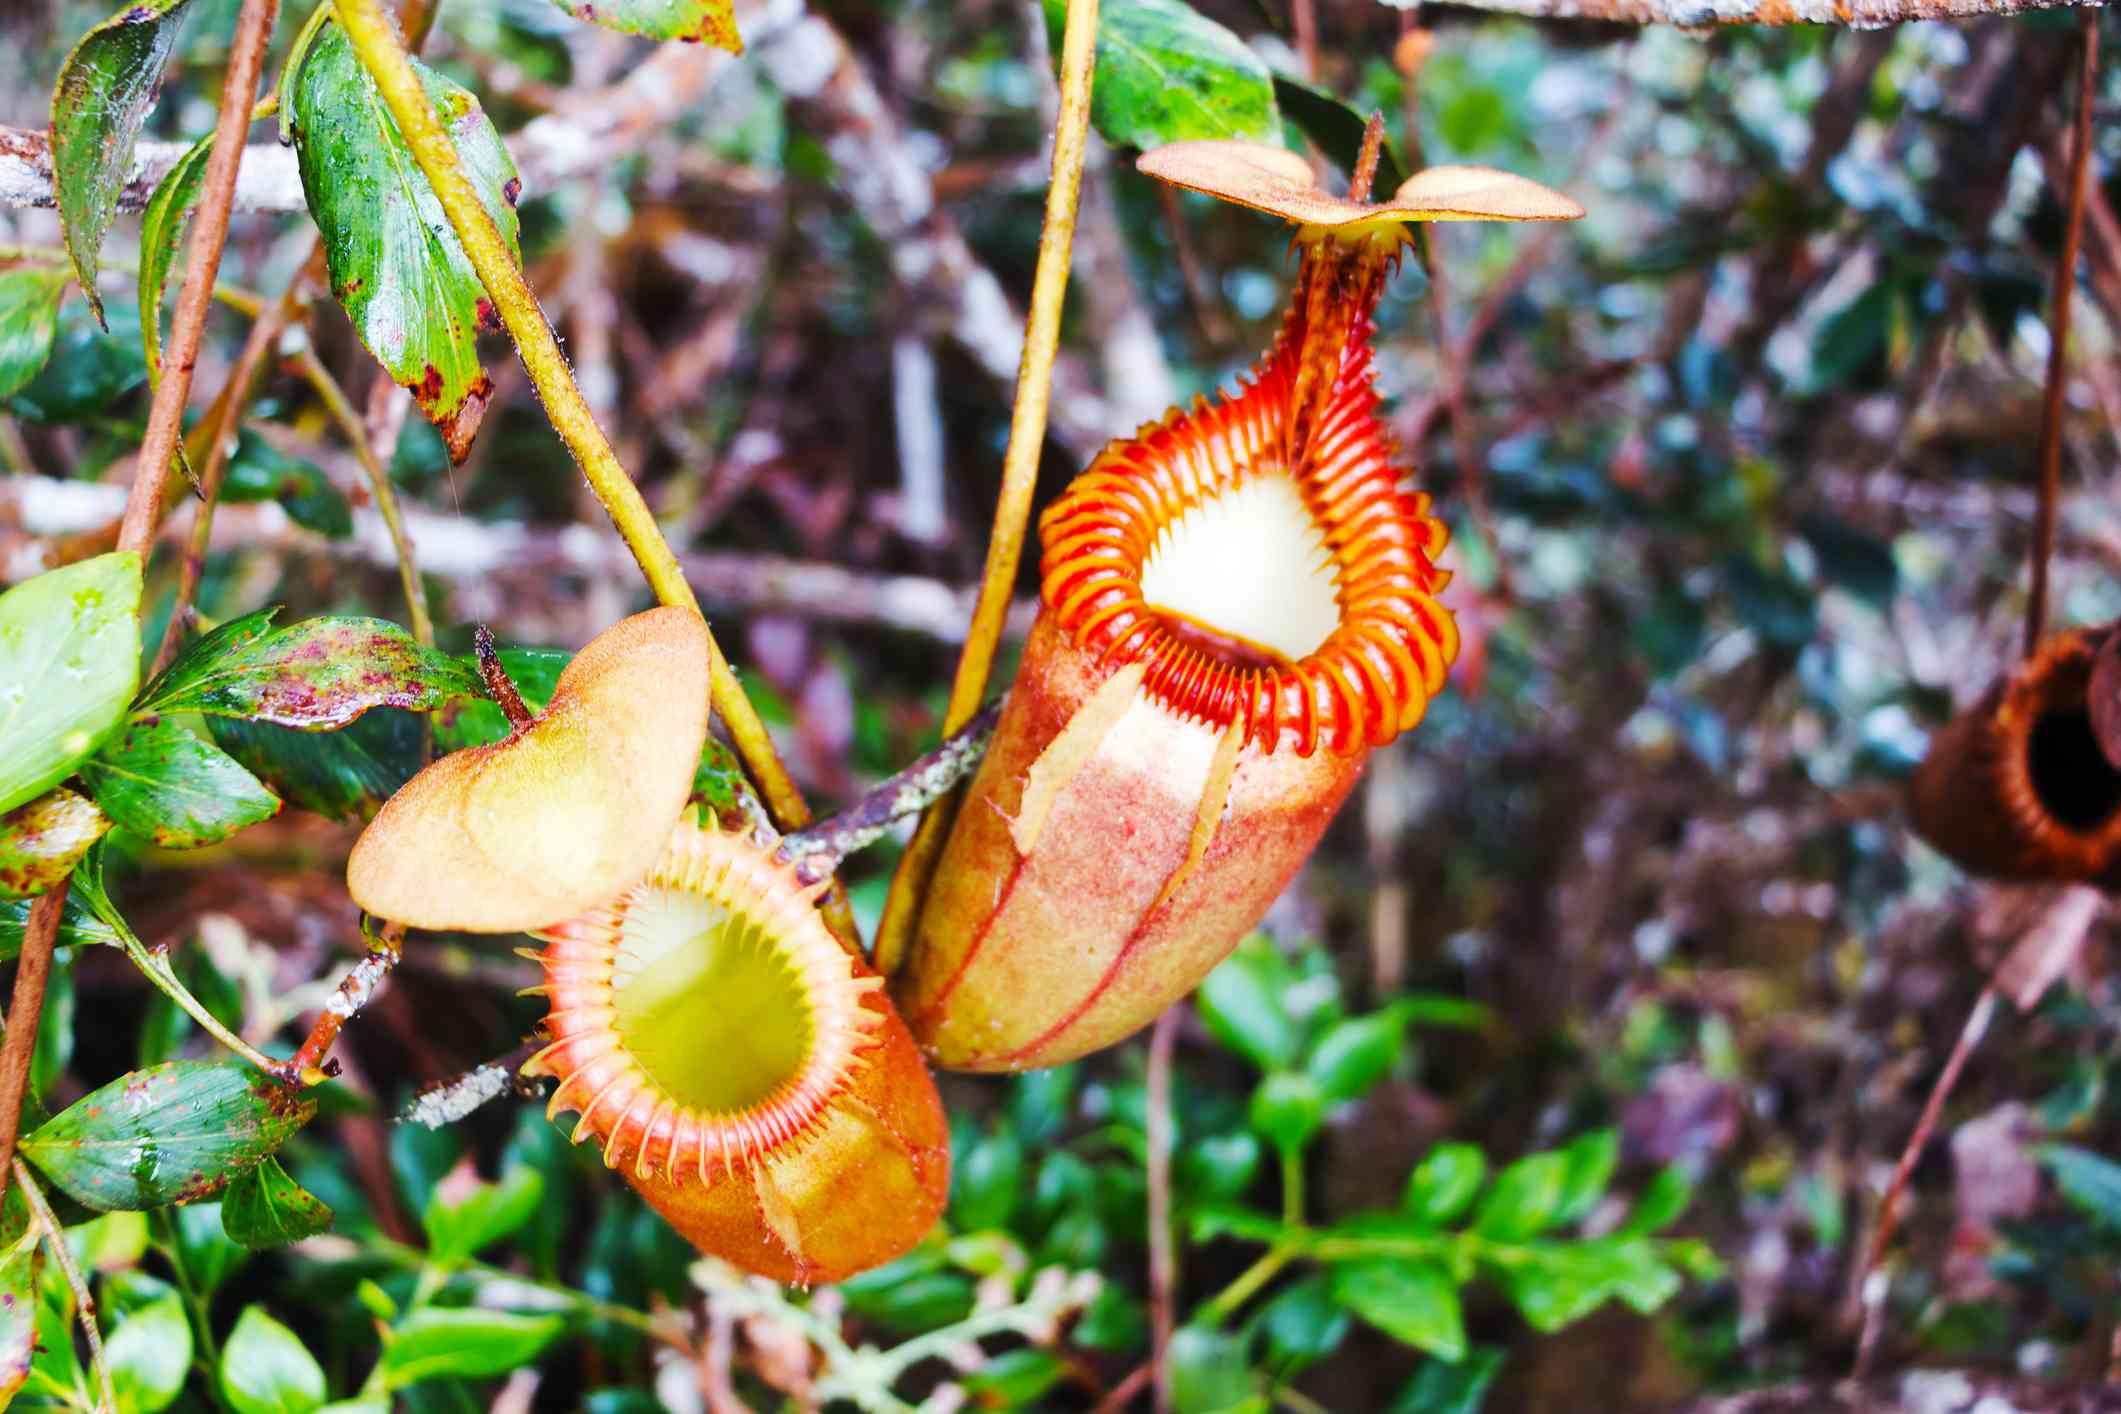 Nepenthes villosa pitcher closeup.